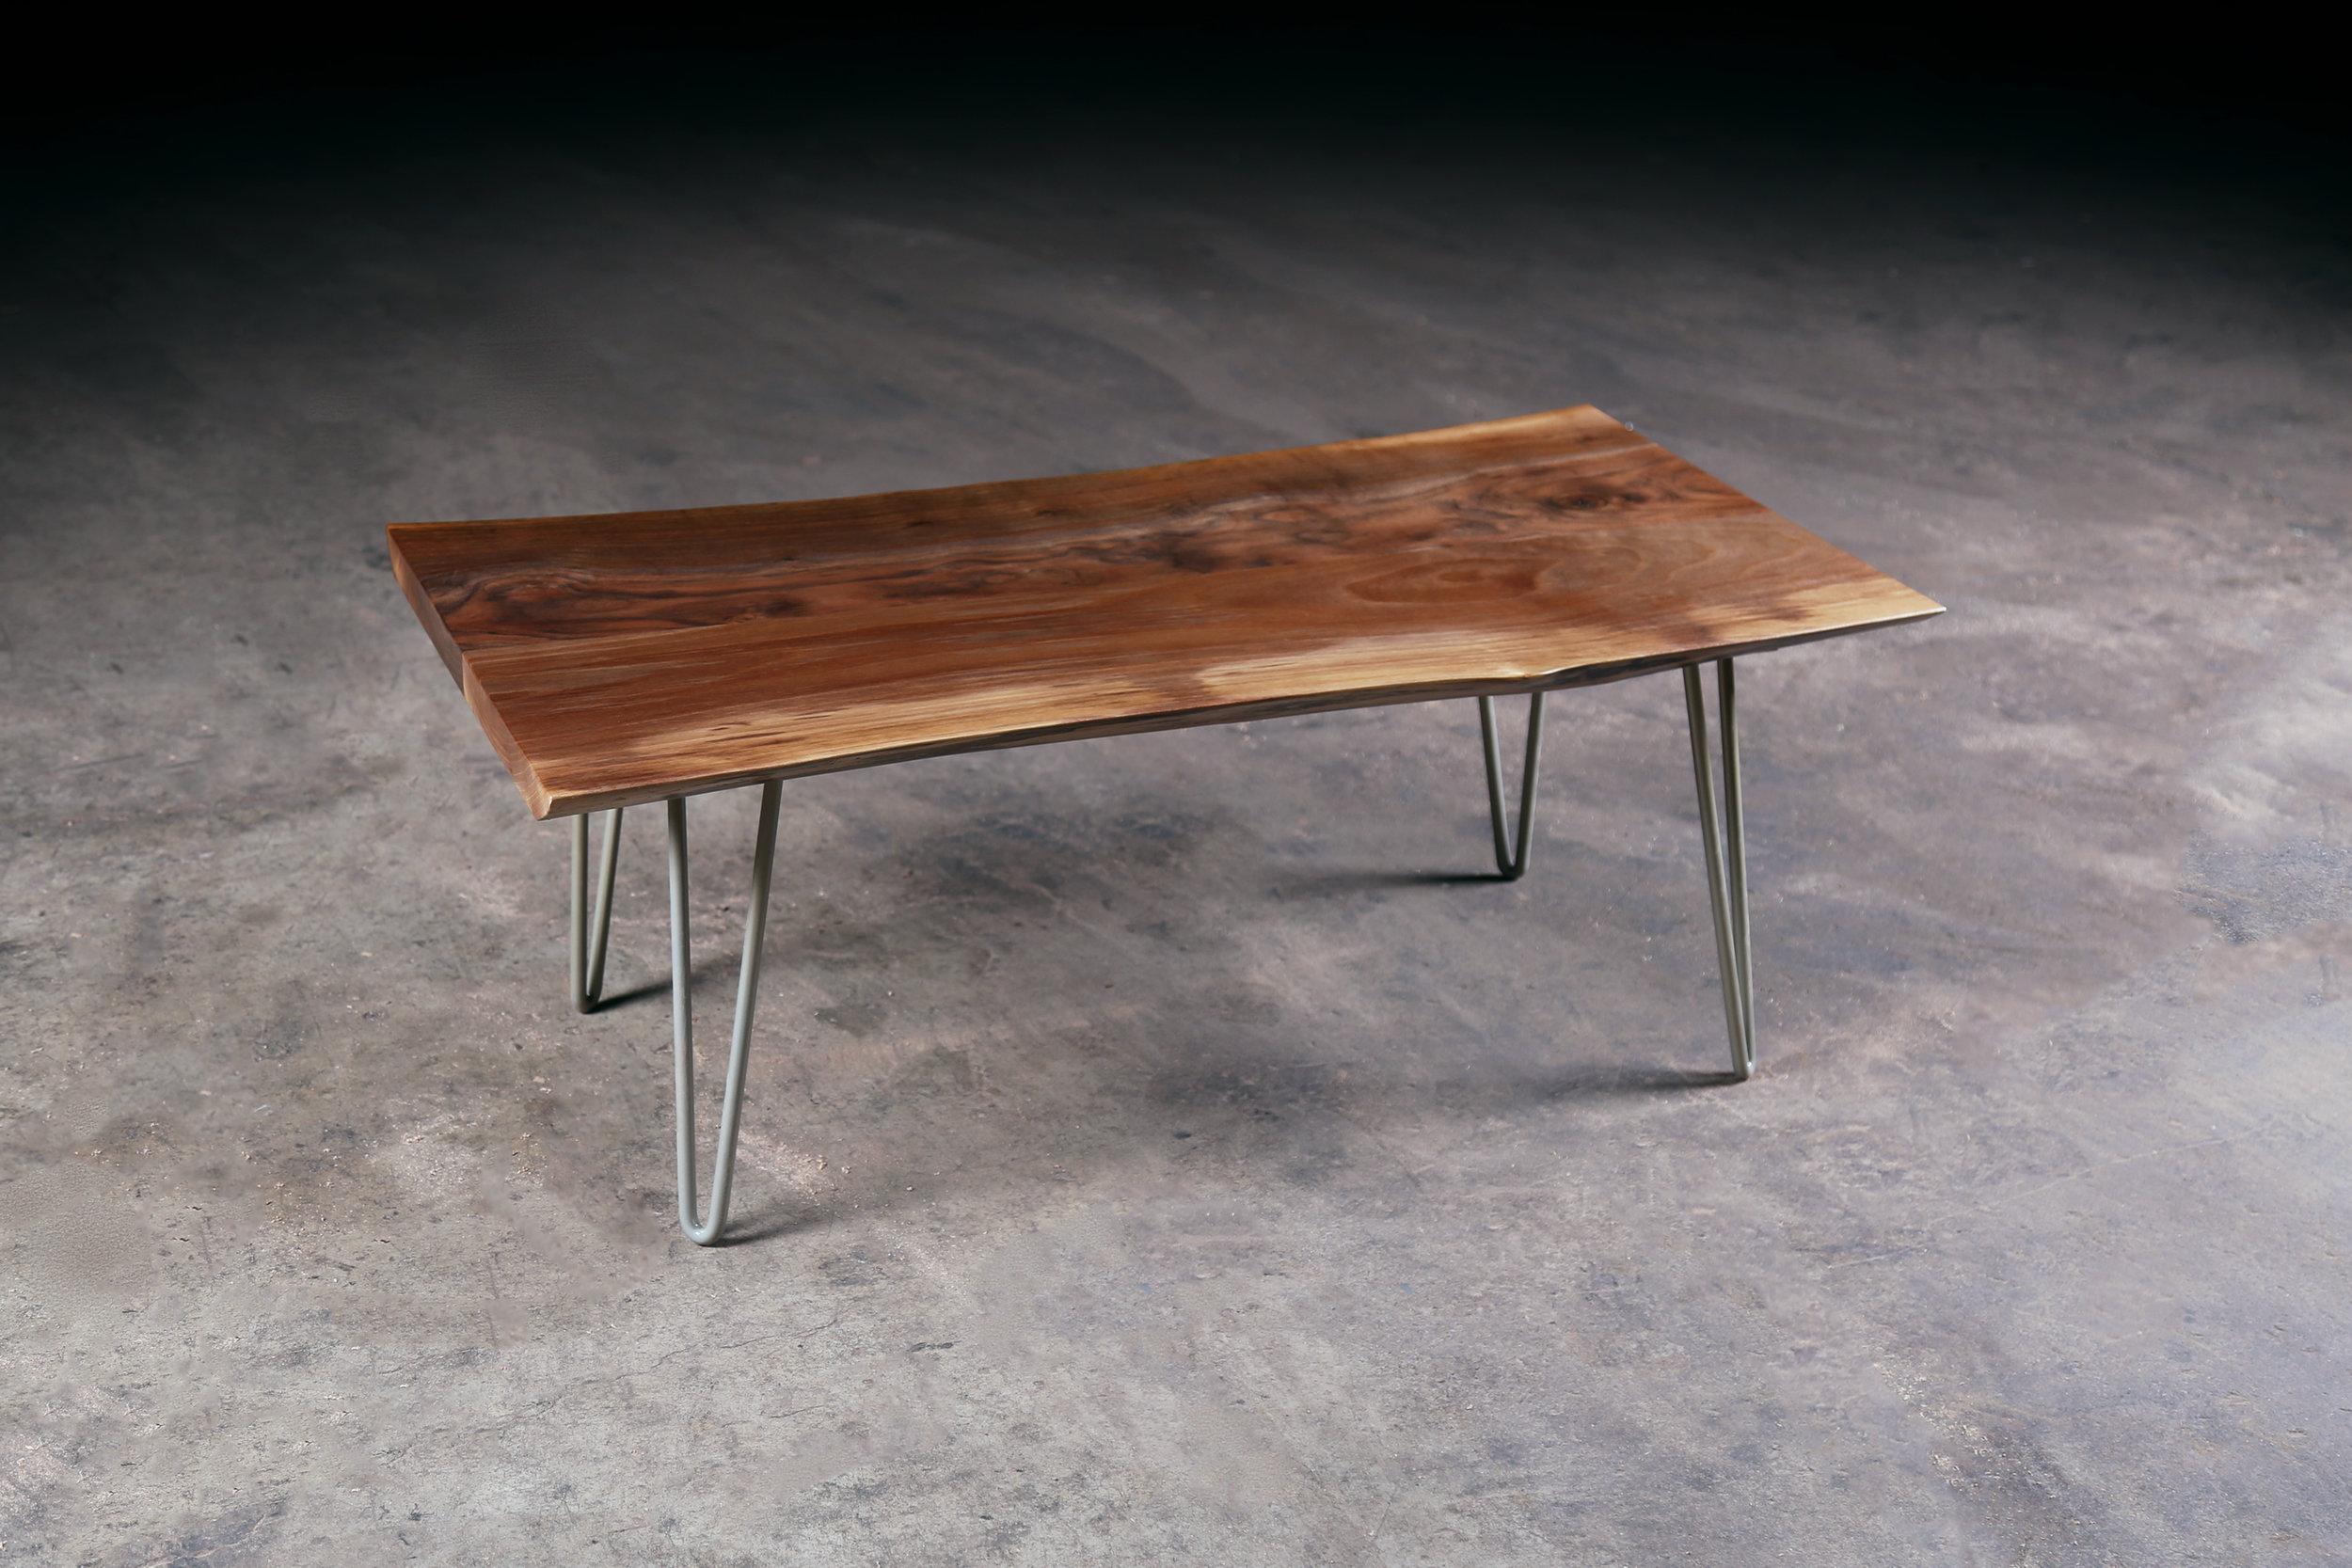 Live Edge Black Walnut Coffee Table W Hairpin Legs Urban Lumber Co